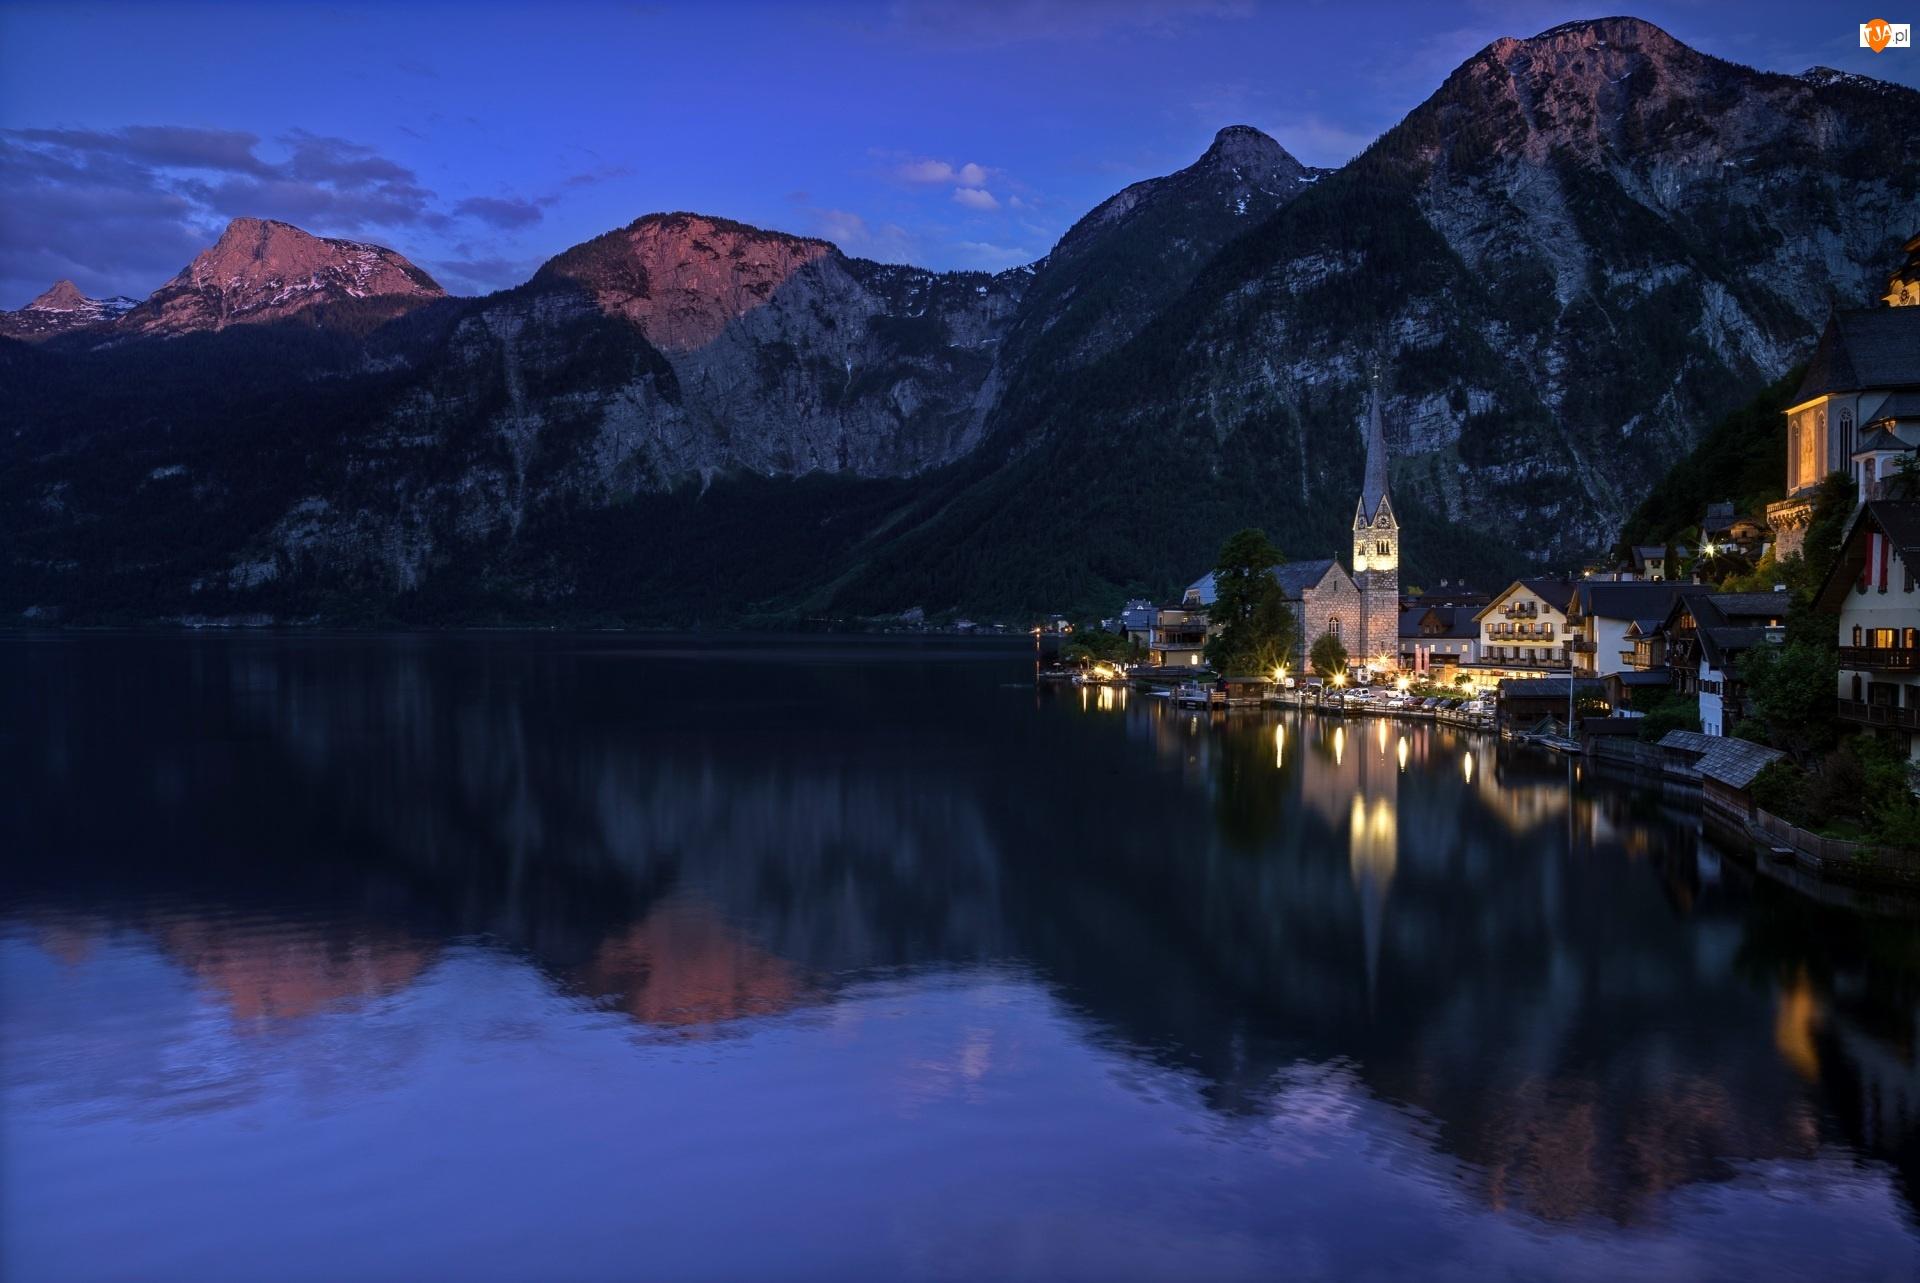 Hallstatt, Domy, Noc, Austria, Góry Alpy Salzburskie, Jezioro Hallstattersee, Kościół